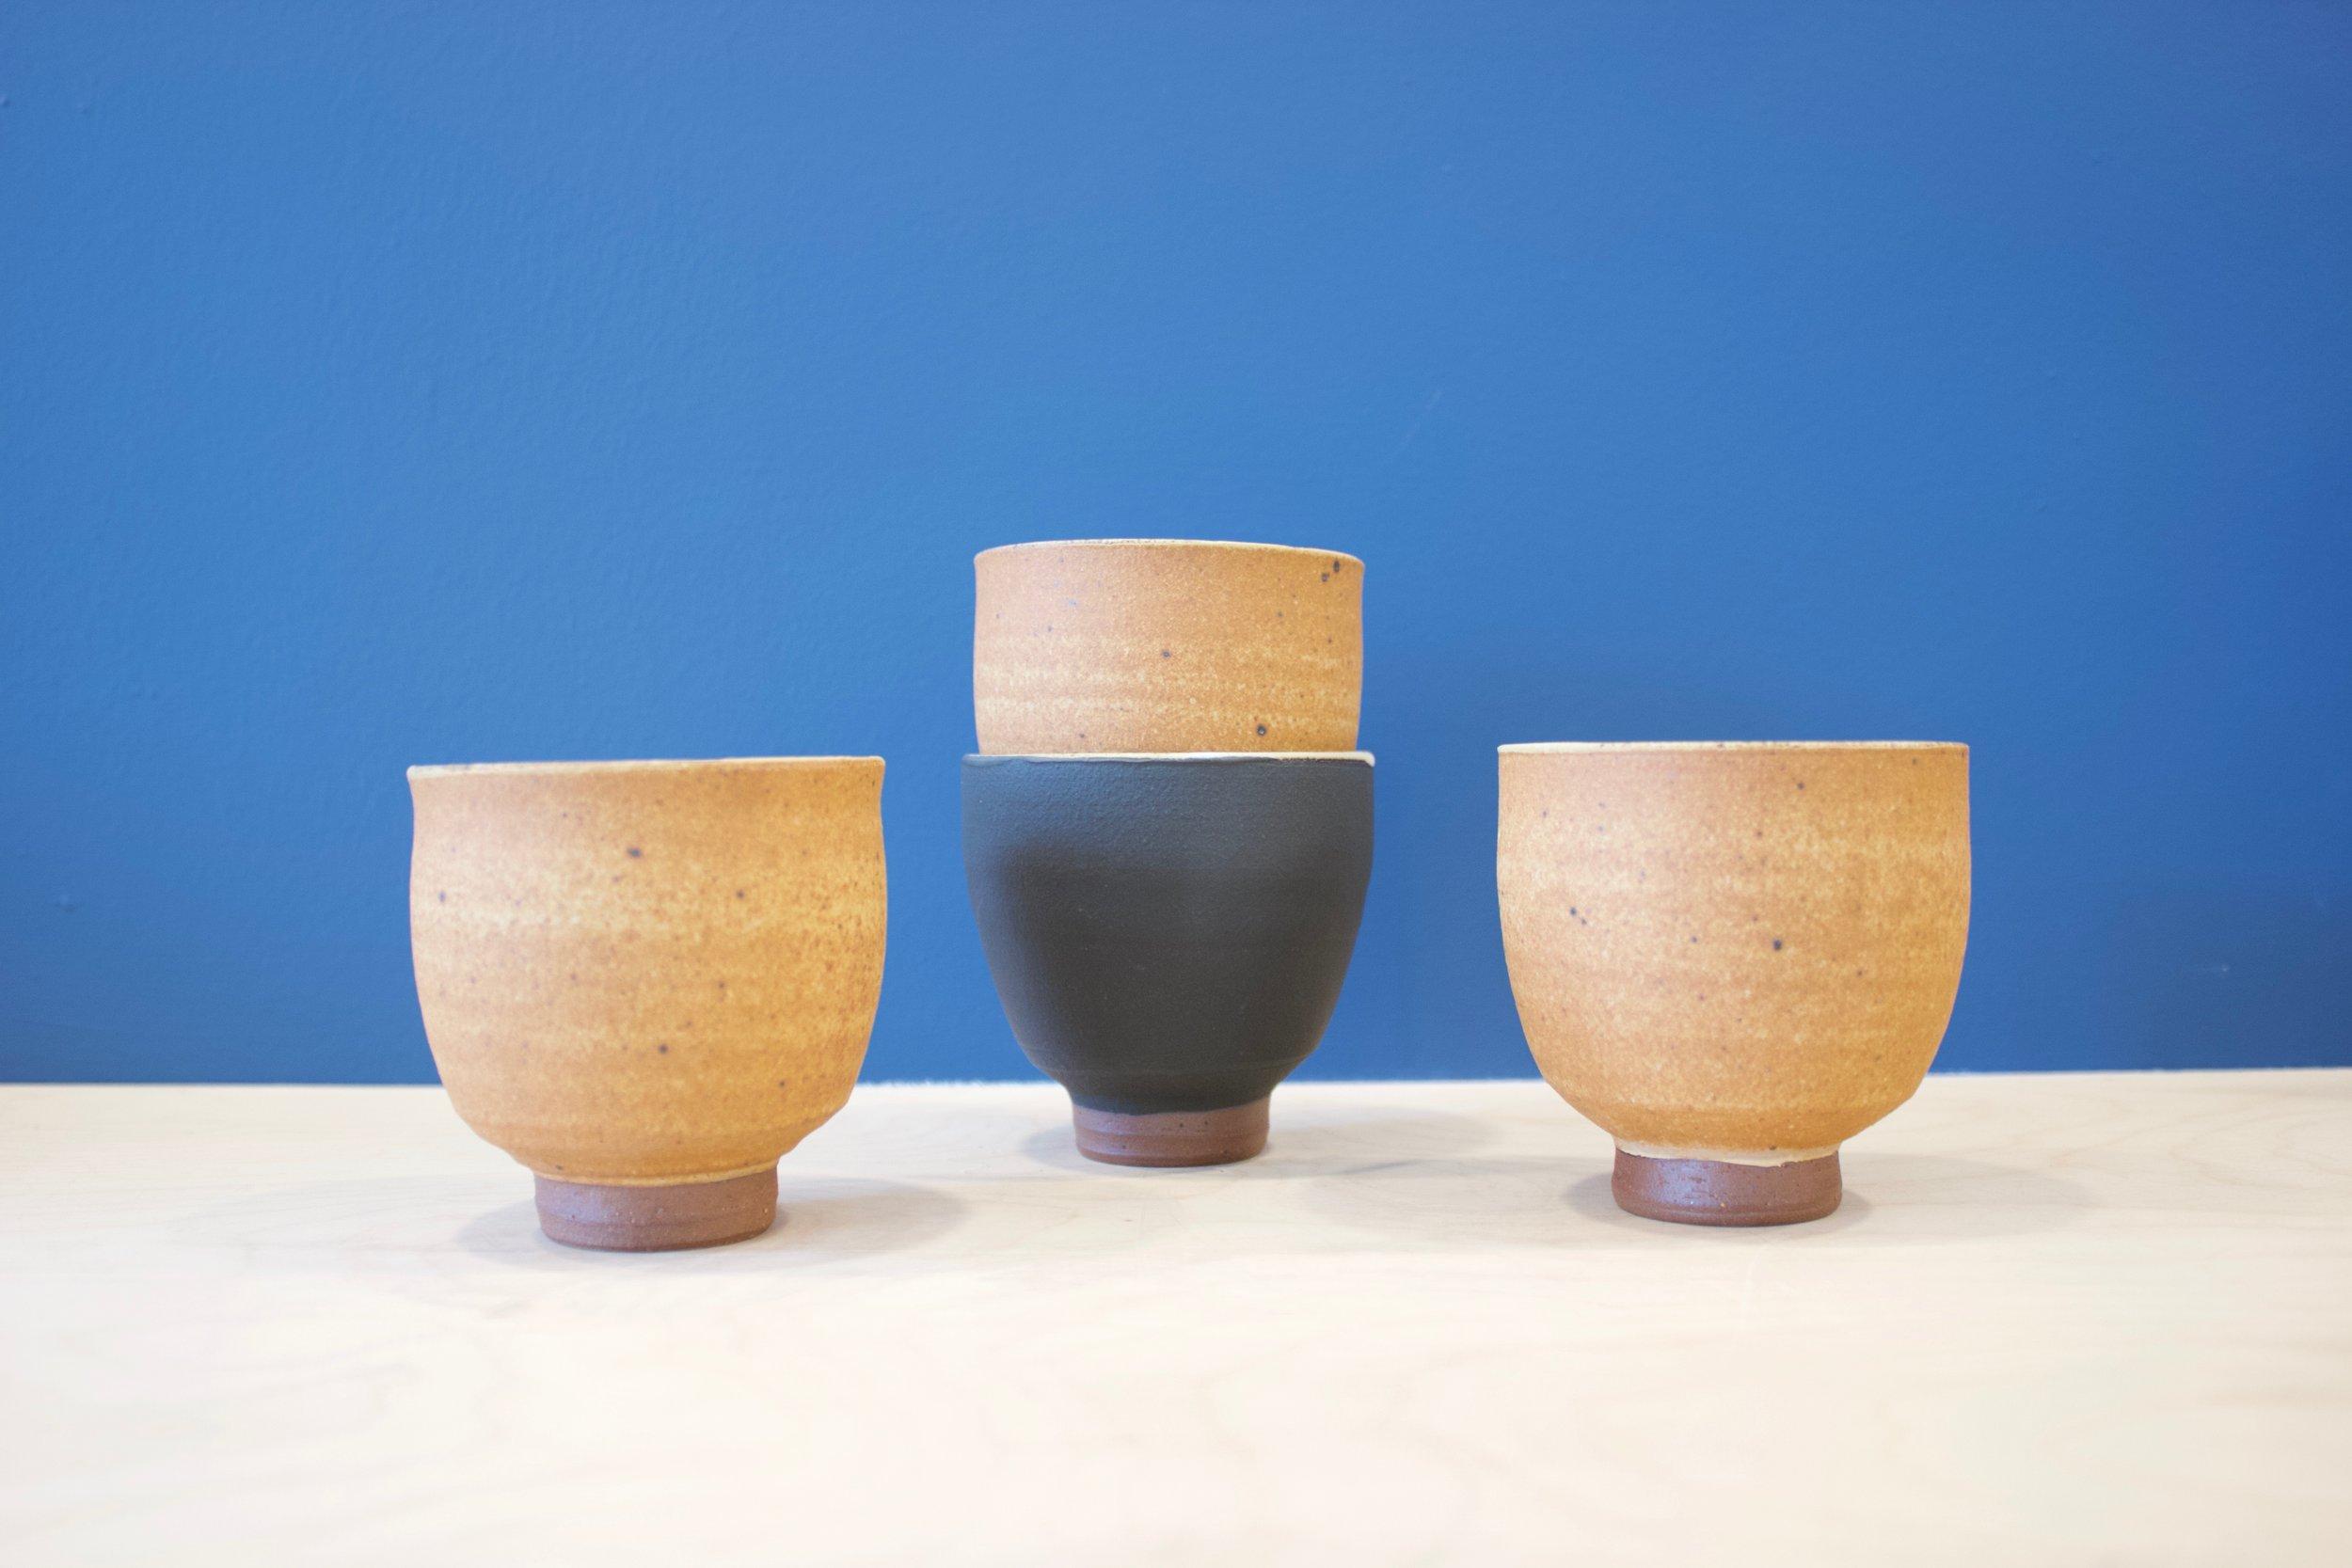 Ali Herbert Yam Cups